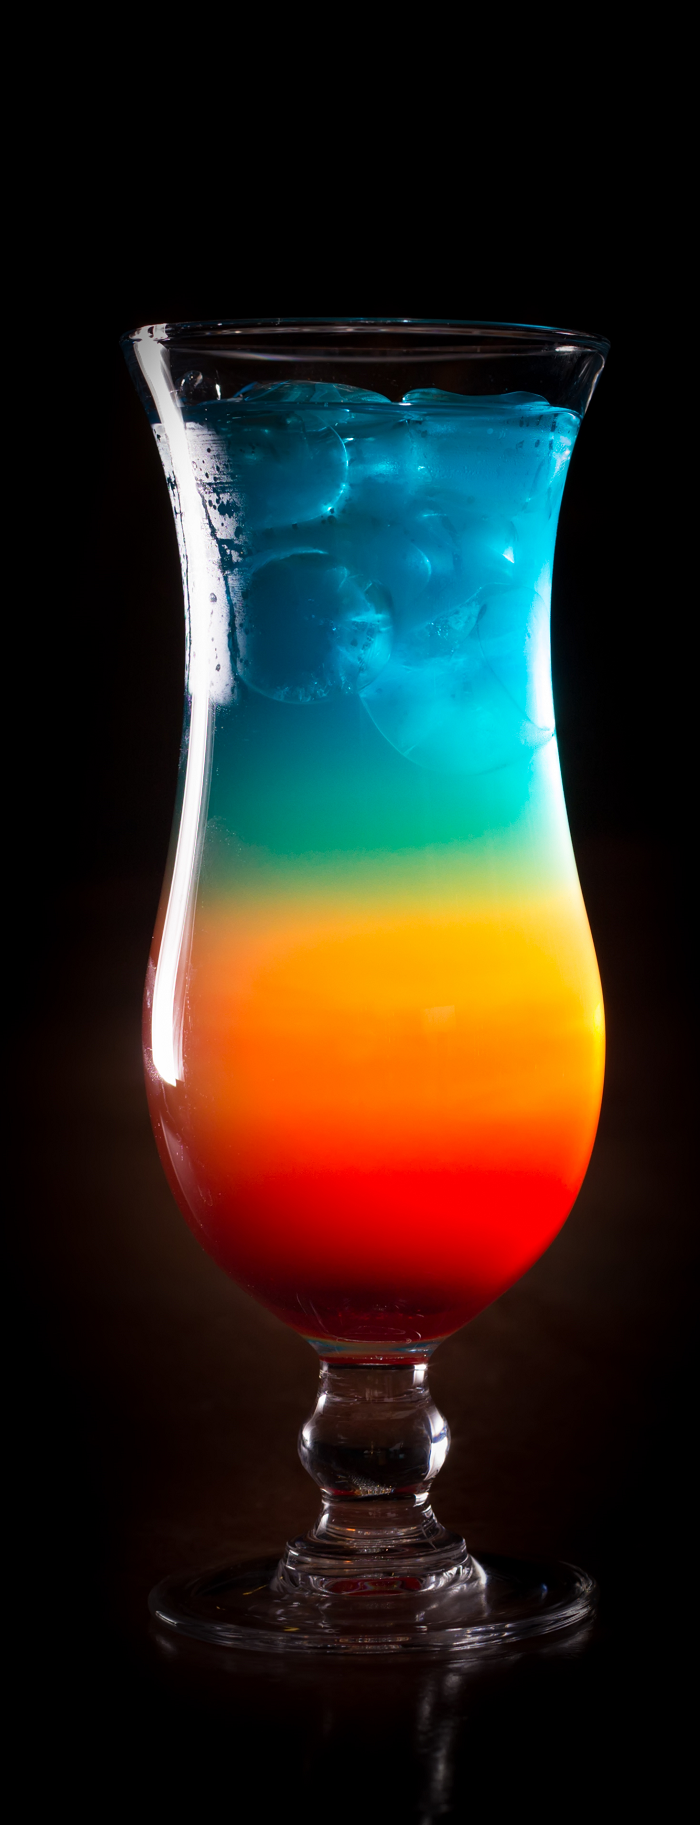 коктейль радуги картинки могут